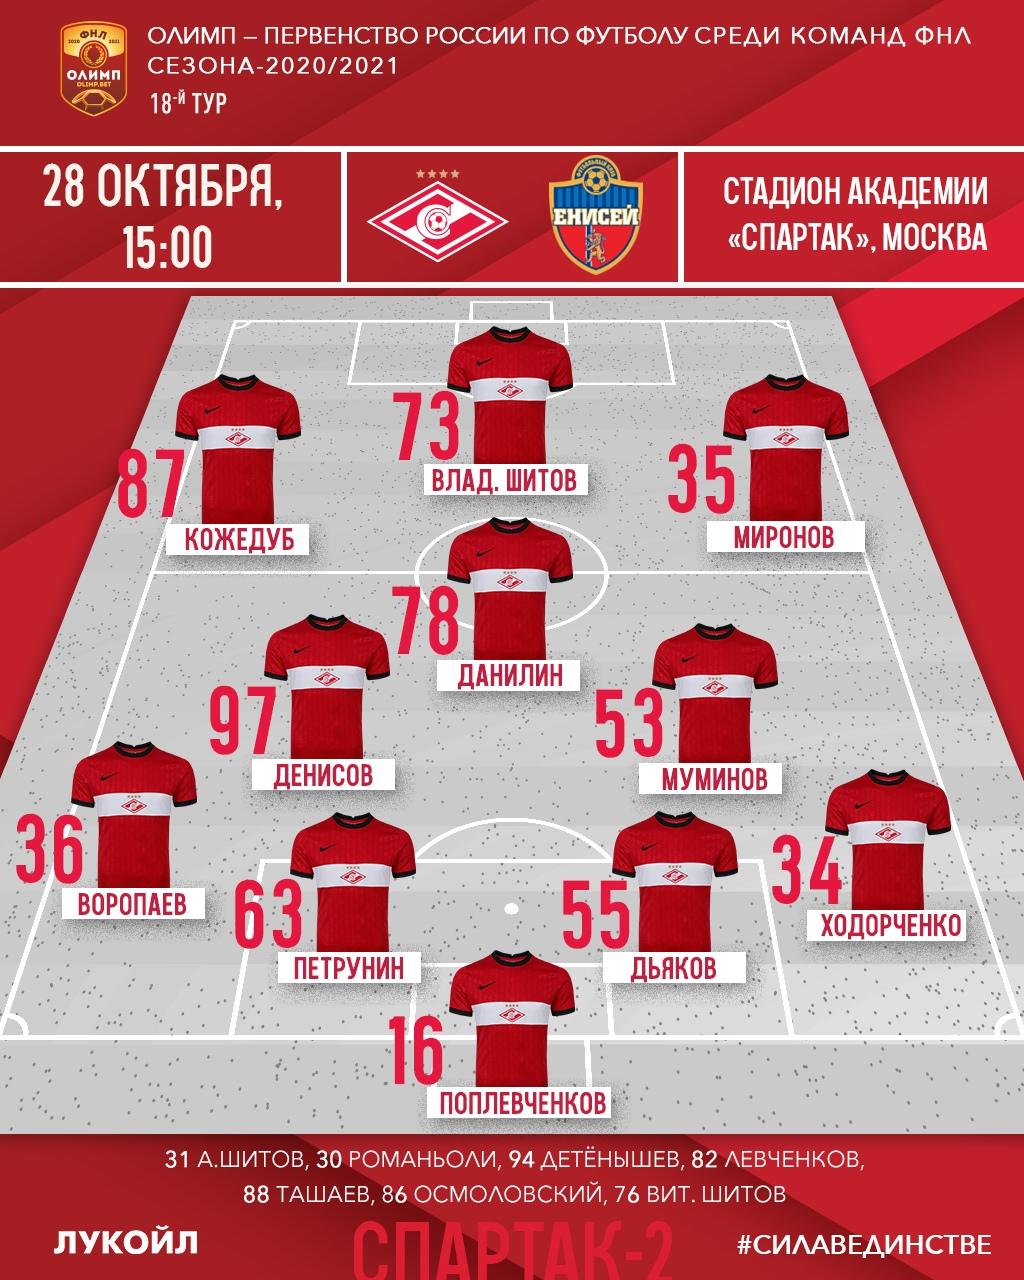 Состав «Спартака-2» на матч 18-го тура ФНЛ с «Енисеем».